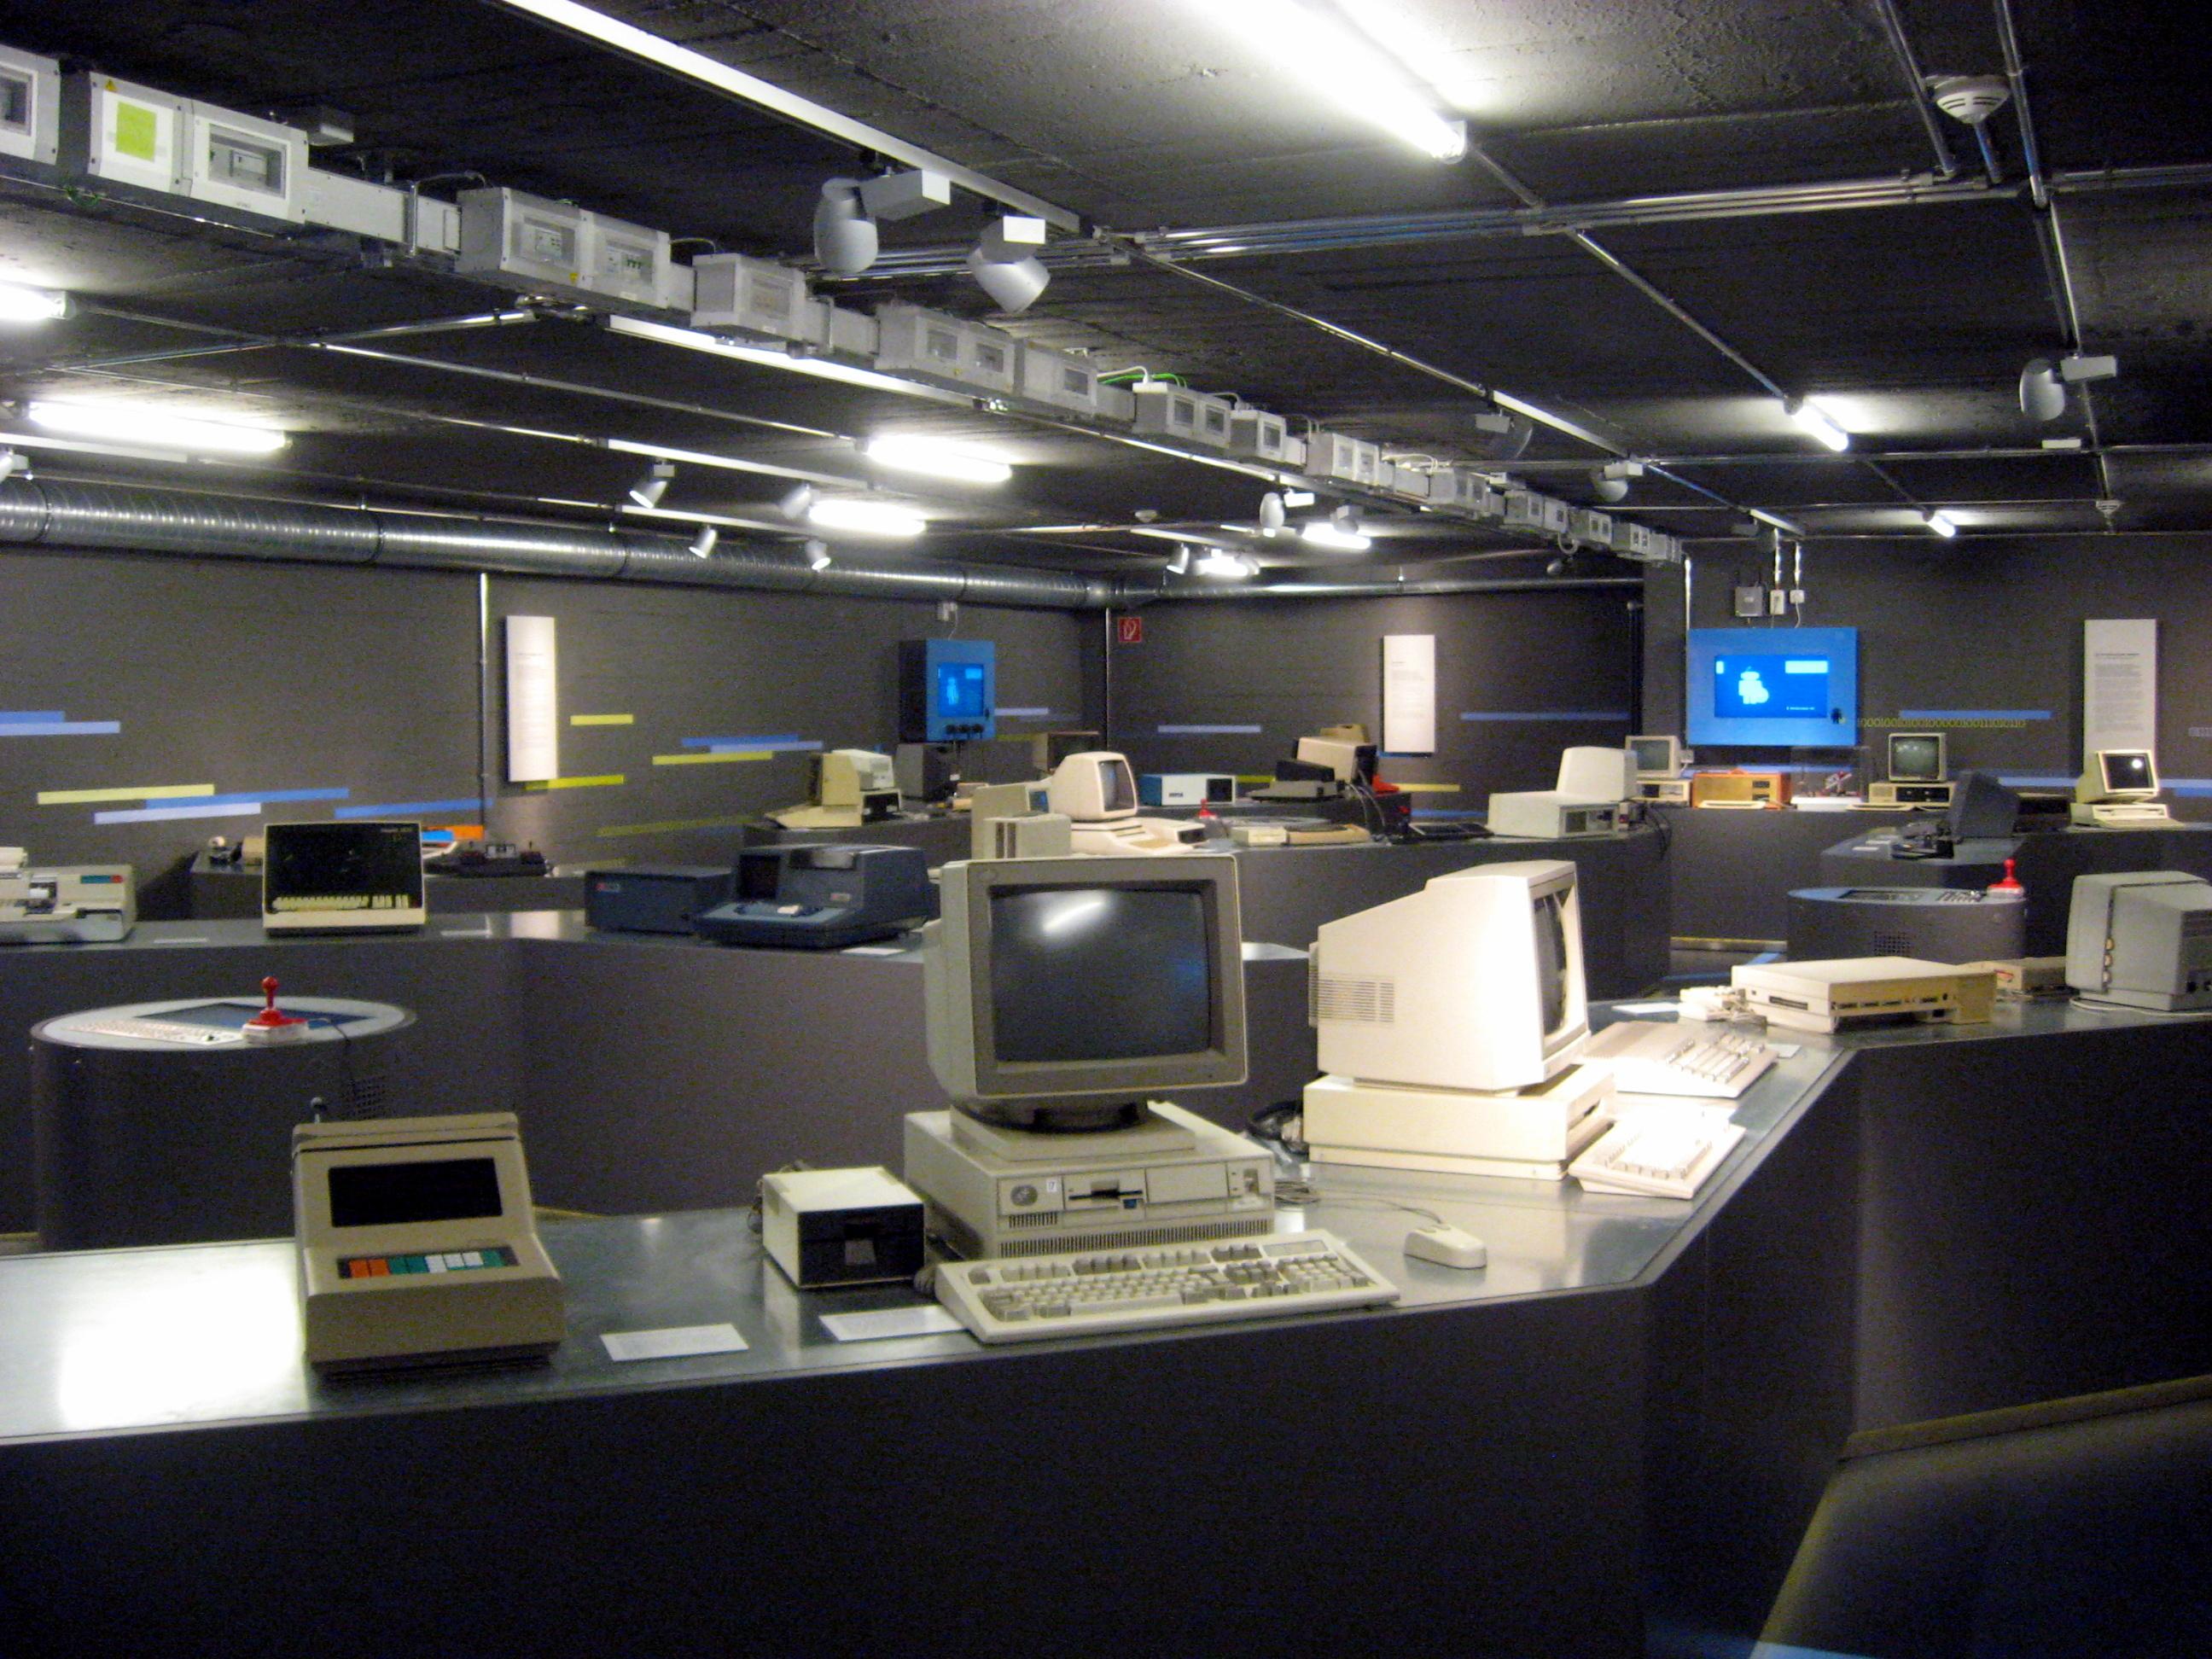 file computermuseum in kiel 2013 ubt jpg wikimedia commons. Black Bedroom Furniture Sets. Home Design Ideas